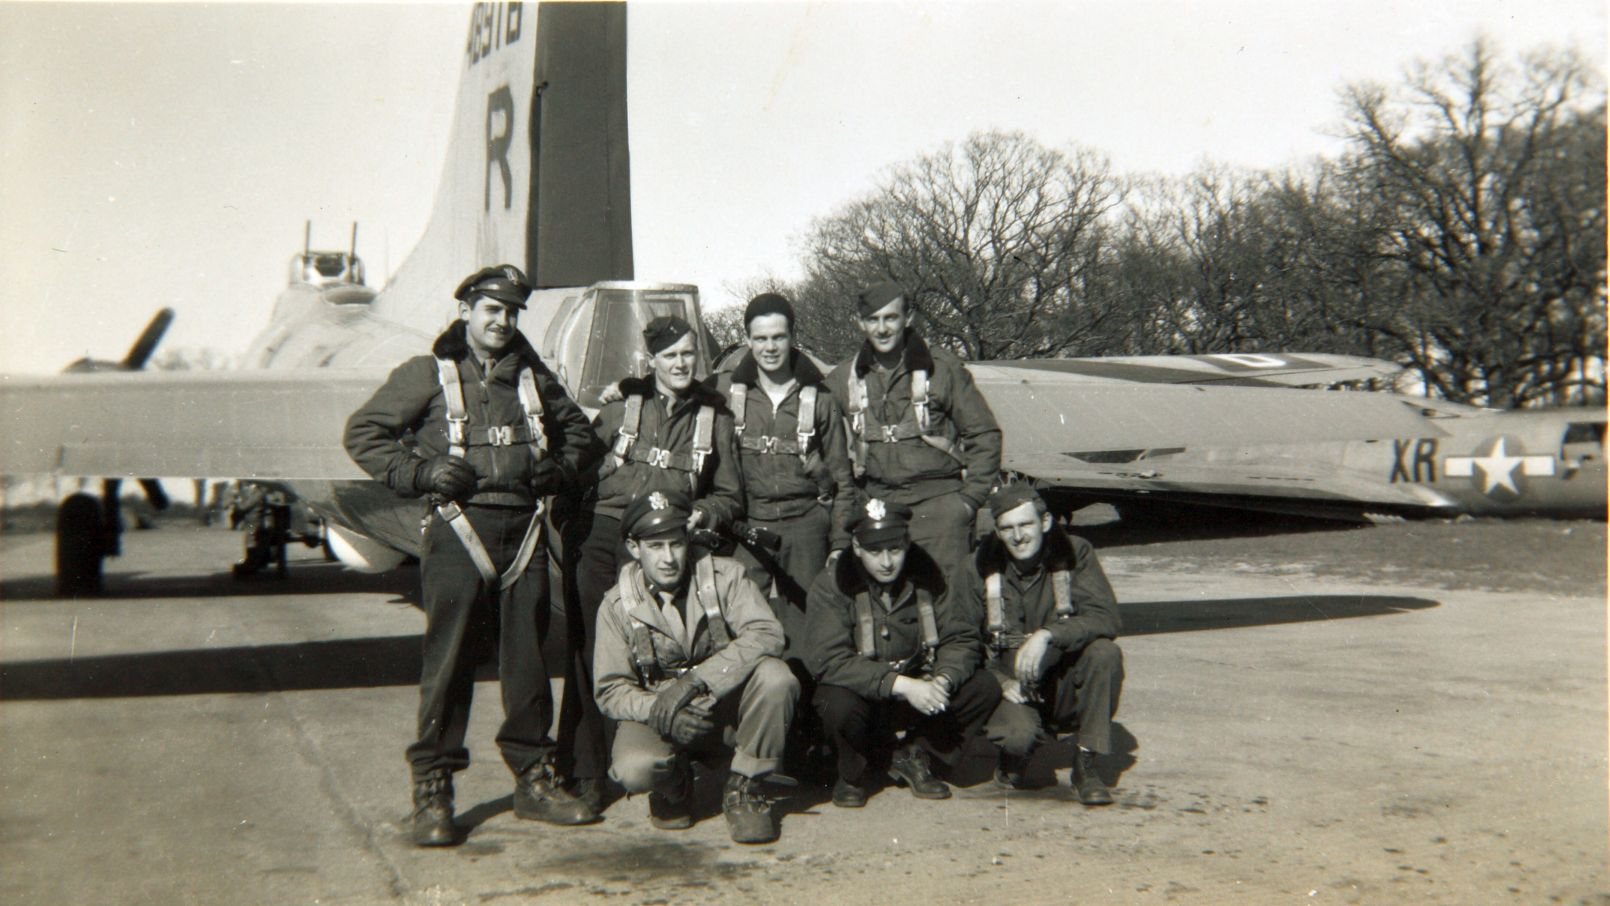 B-17 #44-8916